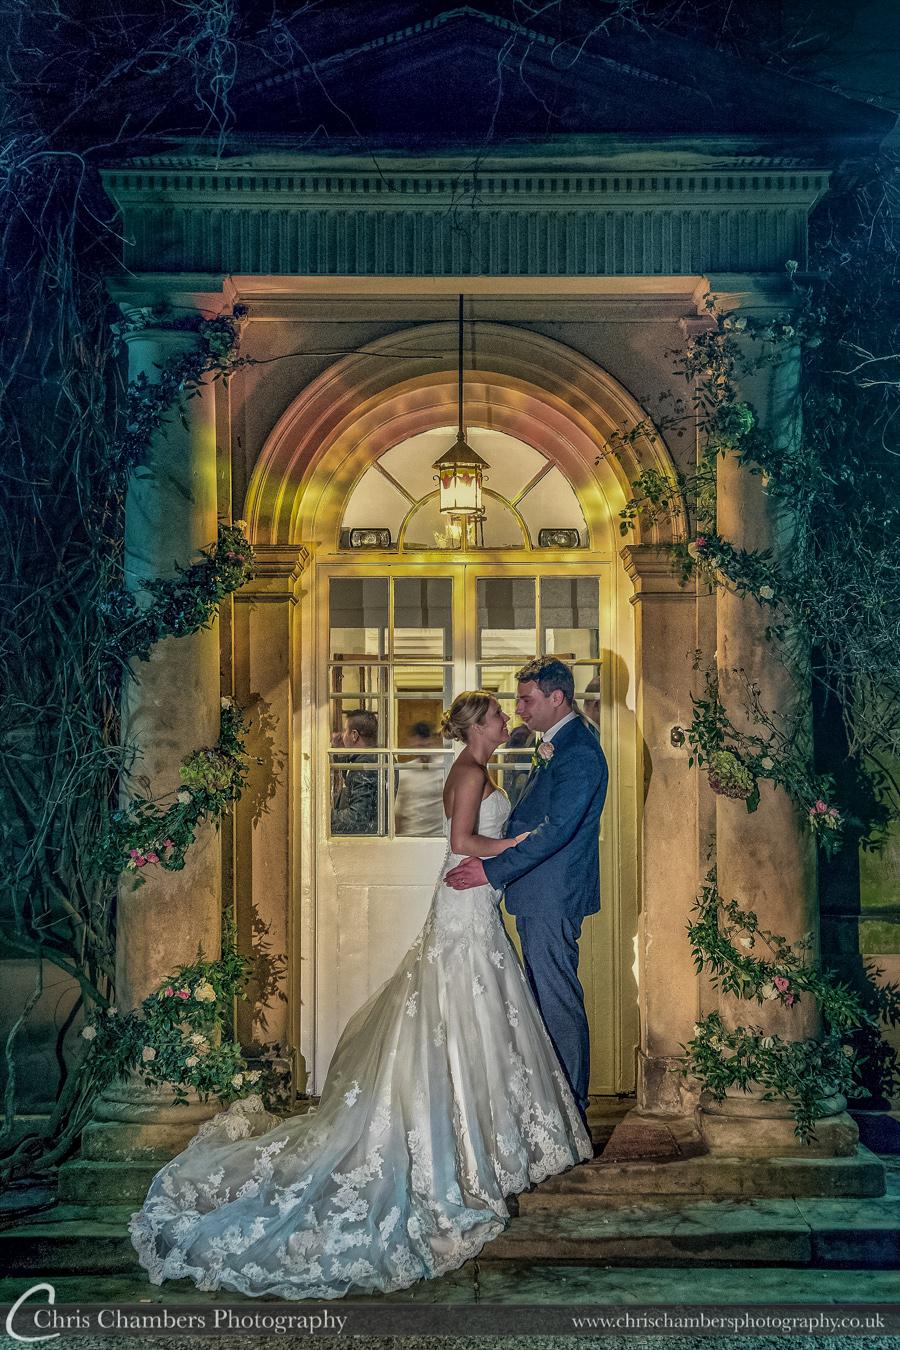 Middleton Lodge Wedding Photographer | Middleton Lodge Wedding Photography in North Yorkshire | Middleton Lodge Wedding Photographer | Award winning wedding photographer Chris Chambers | Middleton Lodge Wedding Photographs